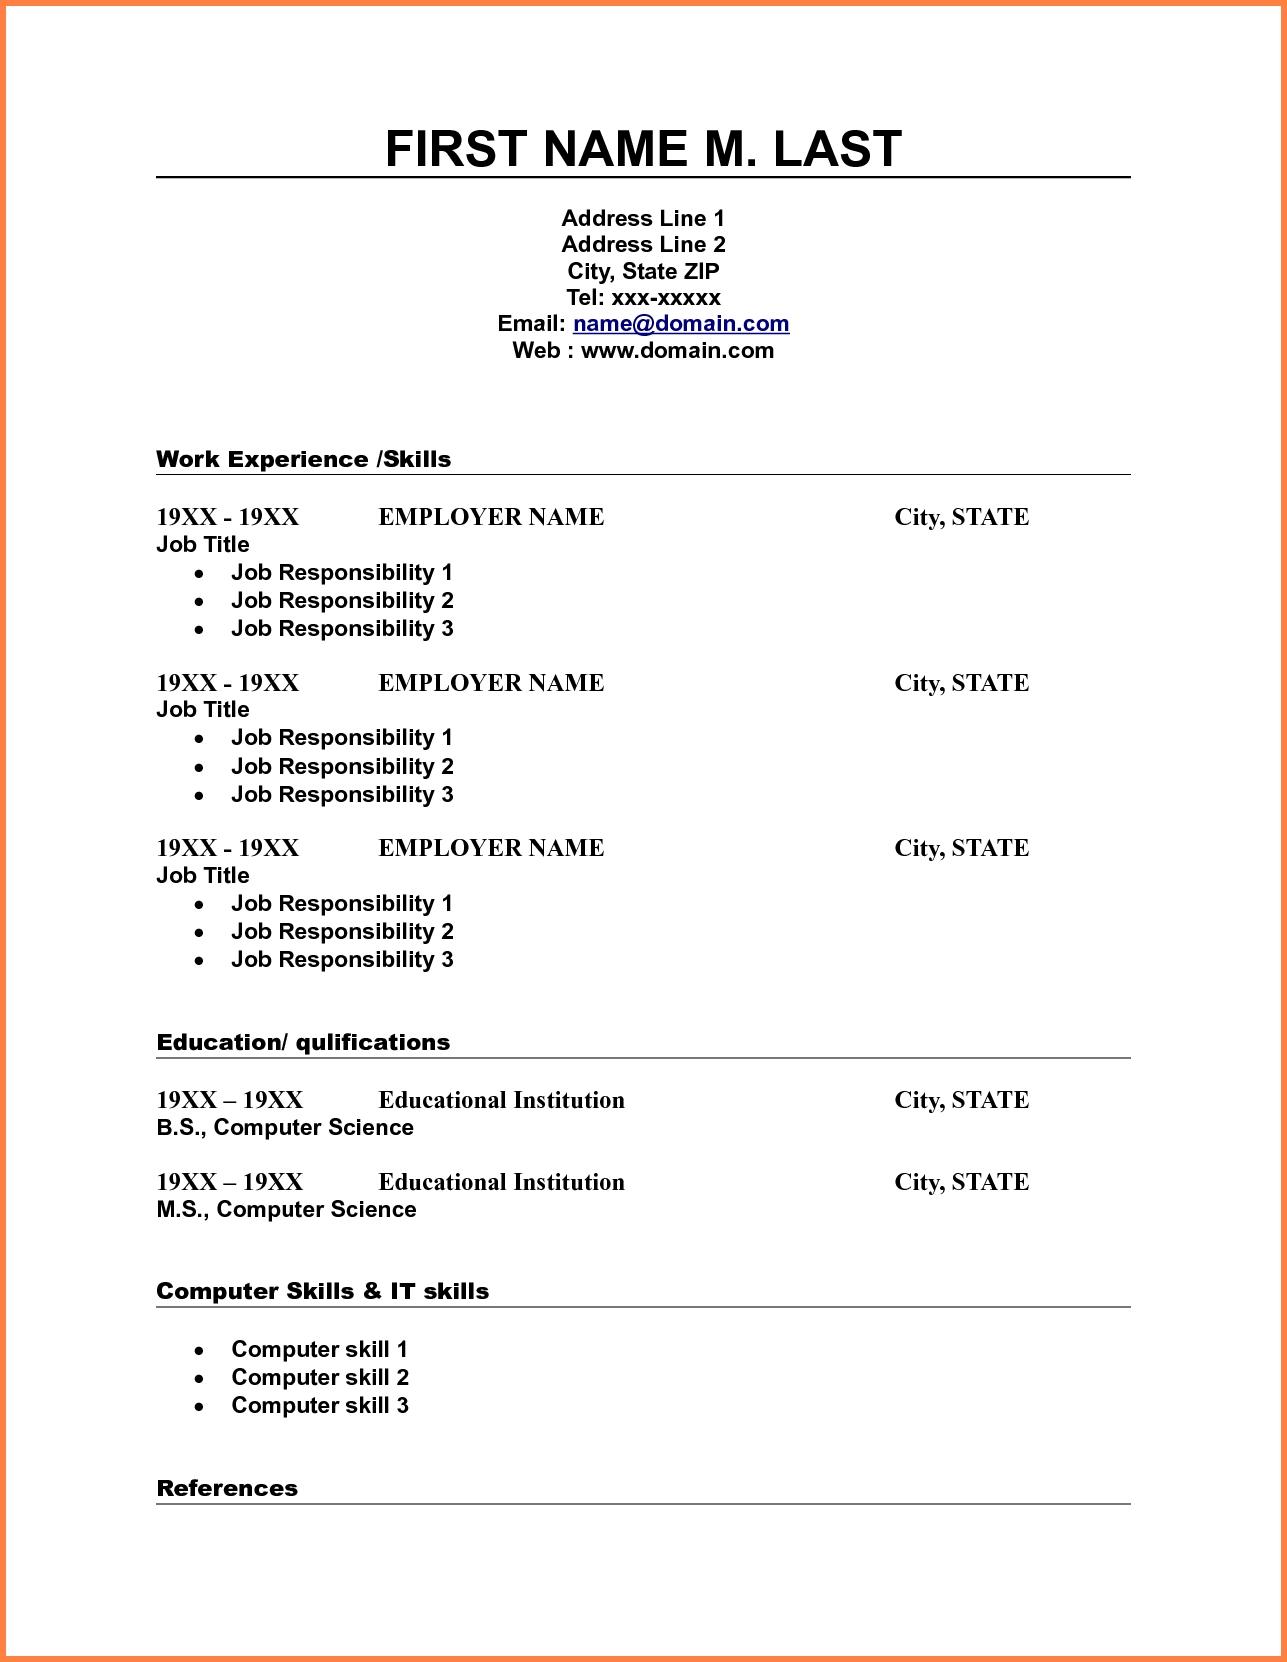 10 Blank Resume Template Pdf Professional List Free Printable 3 - Free Printable Fill In The Blank Resume Templates